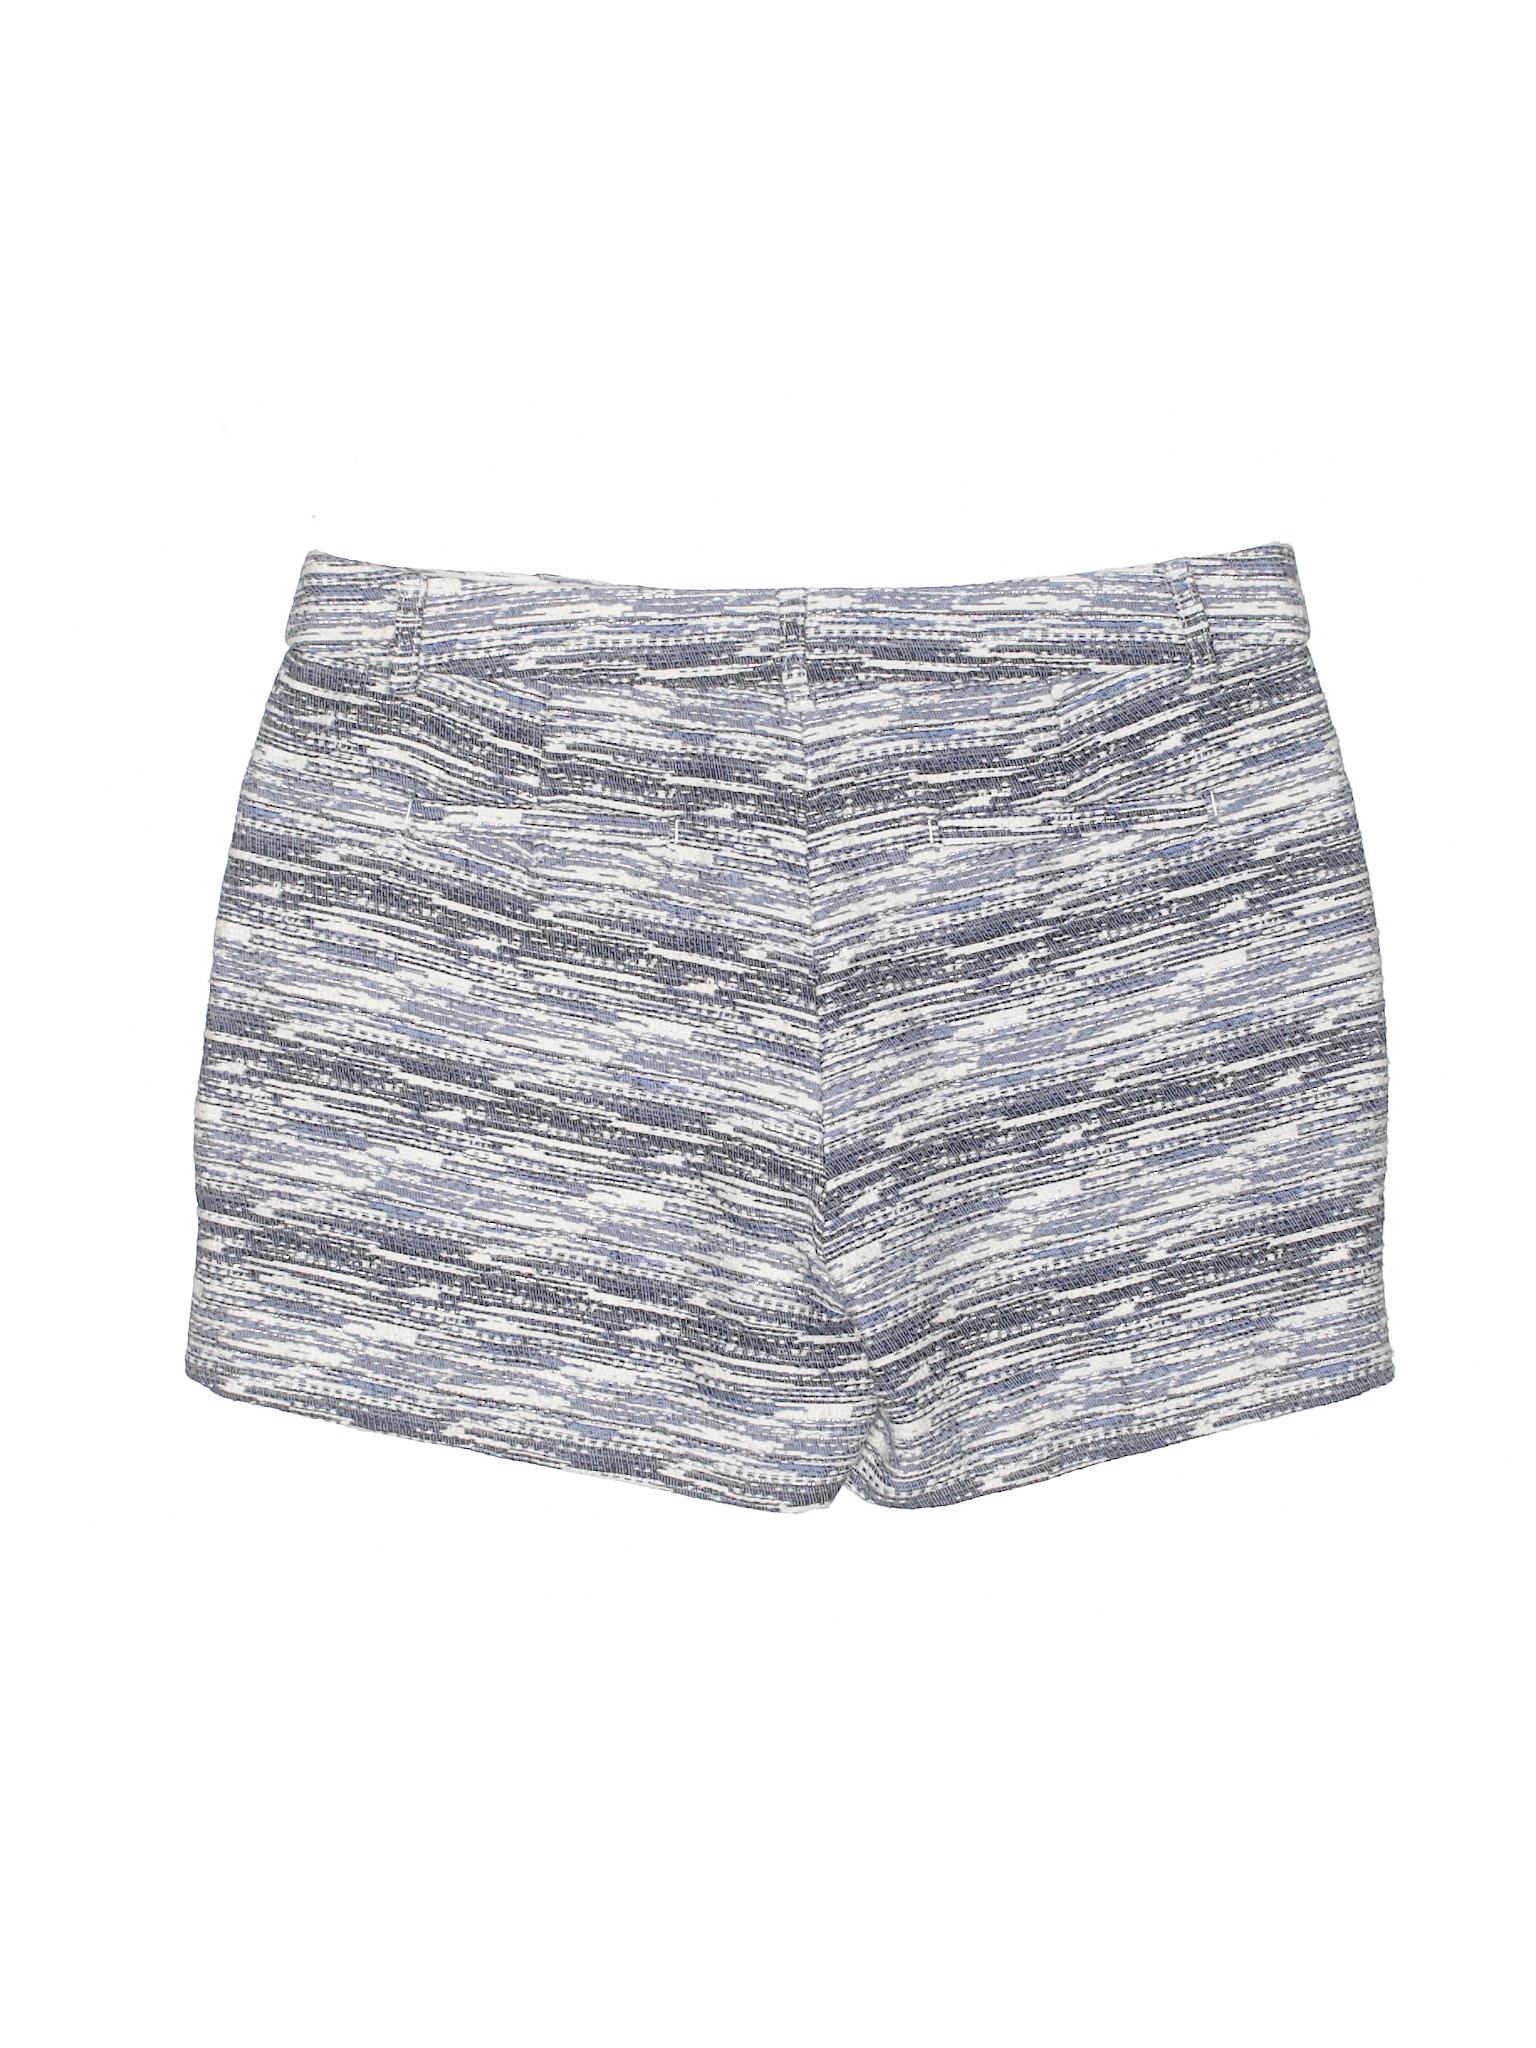 Barclay Shorts Boutique Barclay Katherine Boutique Katherine Odvxqp00